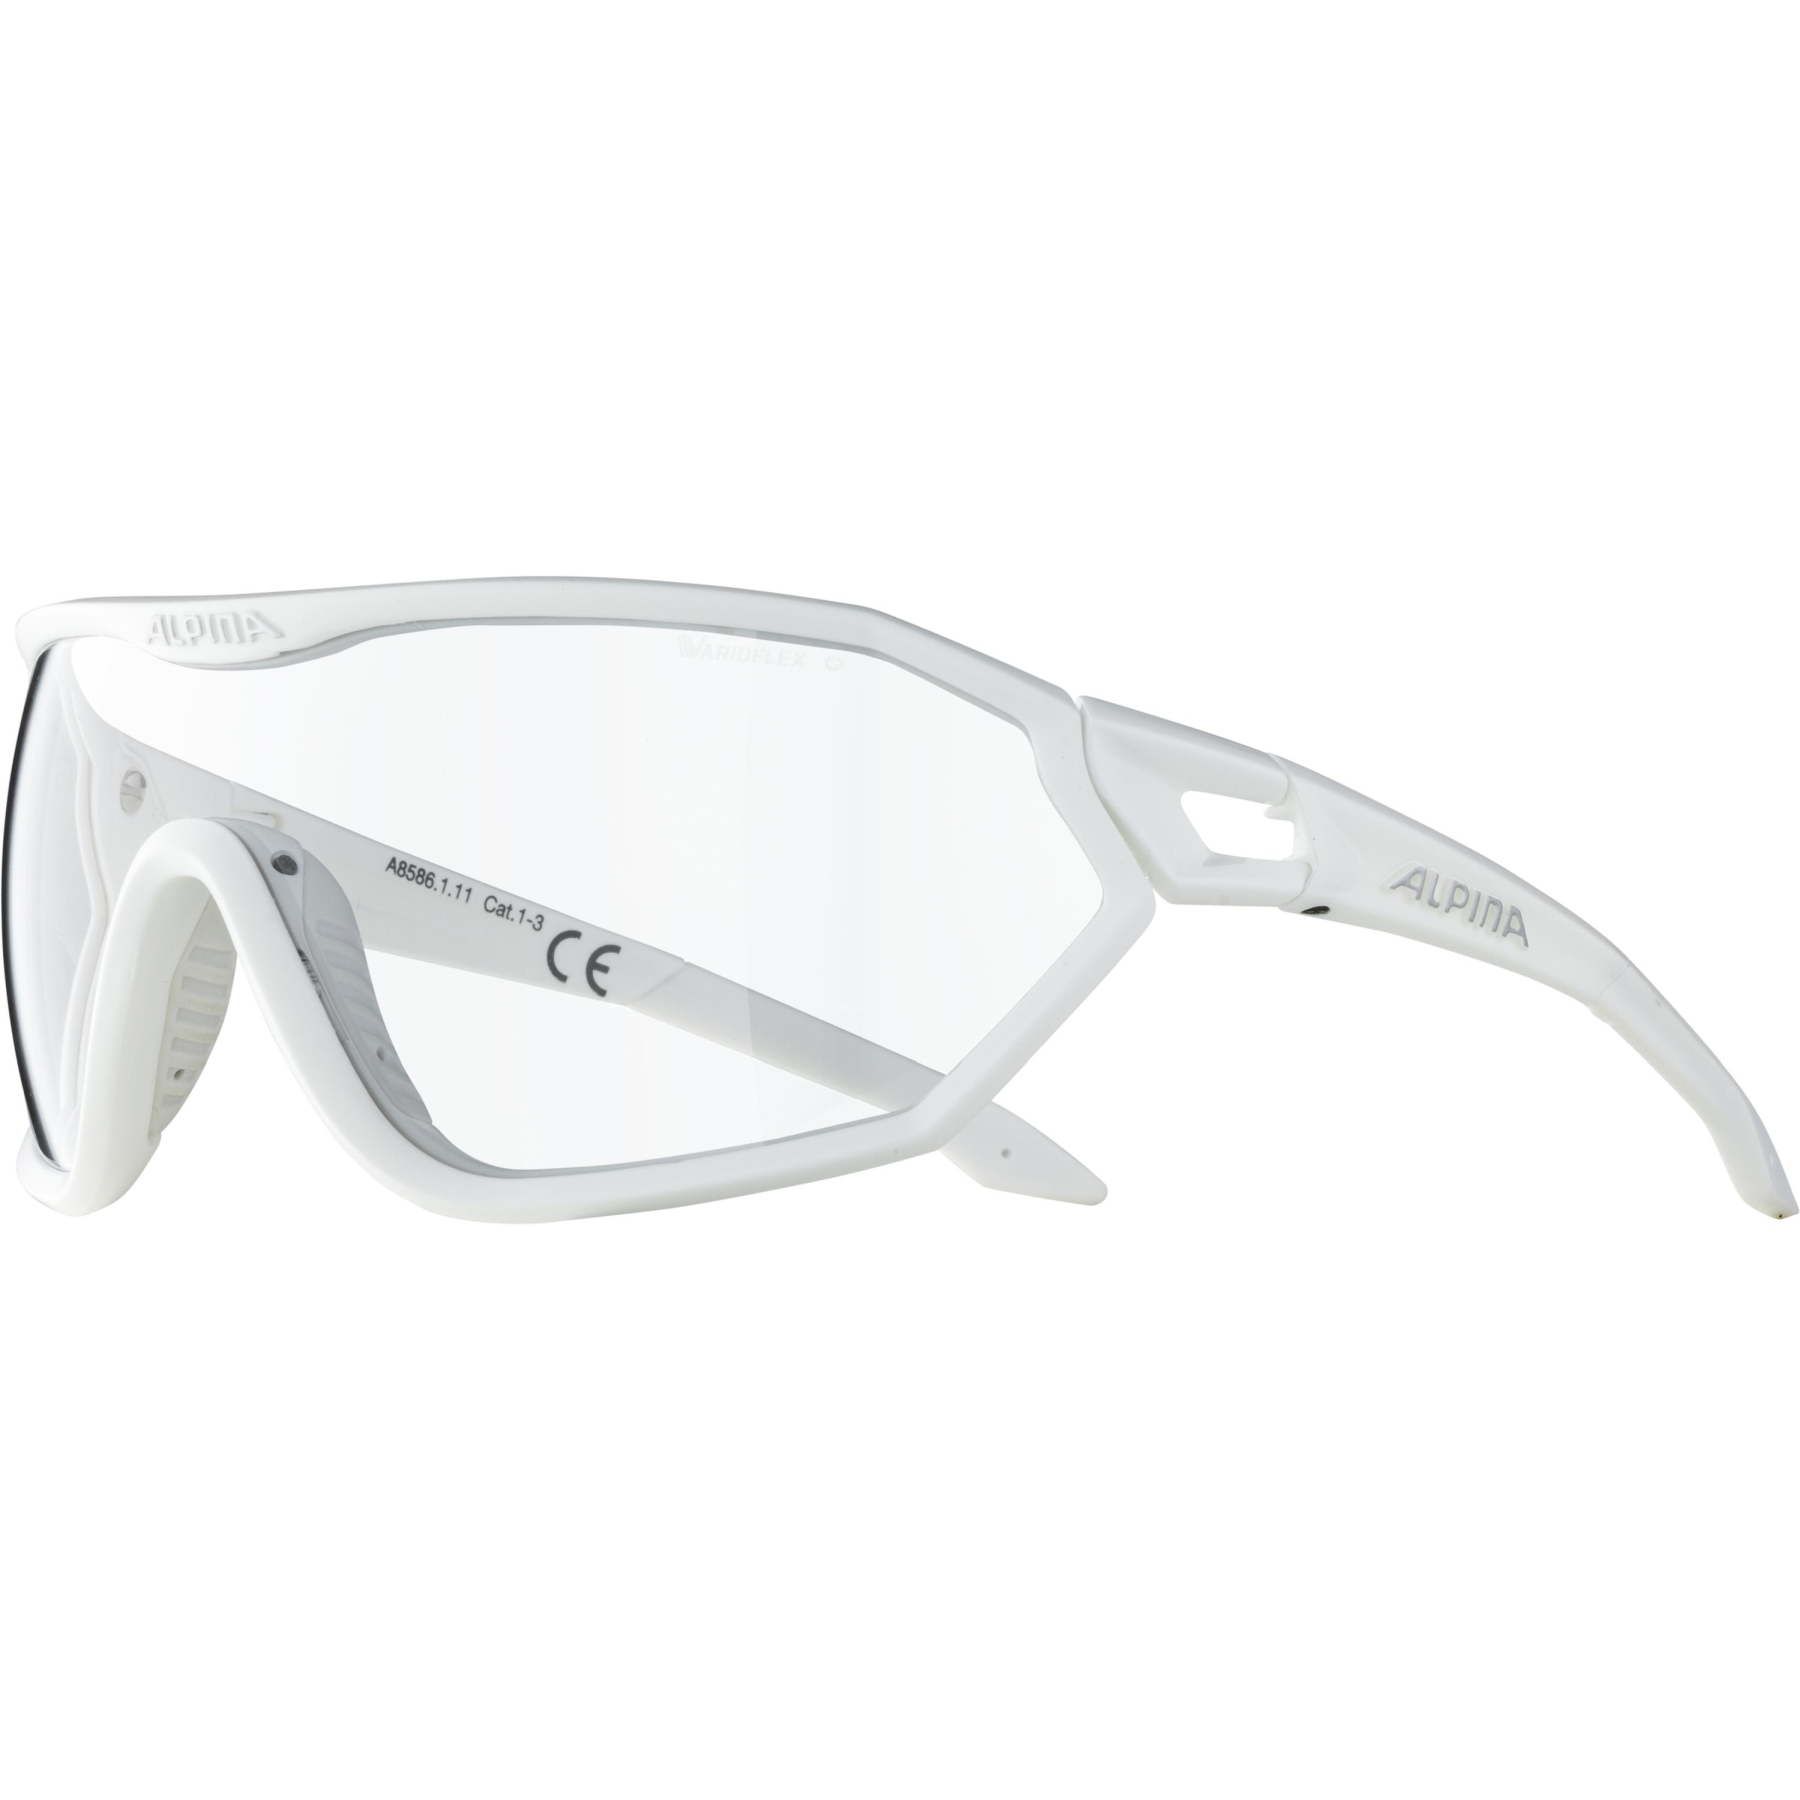 Image of Alpina S-Way VL+ Glasses - white matt / Varioflex black